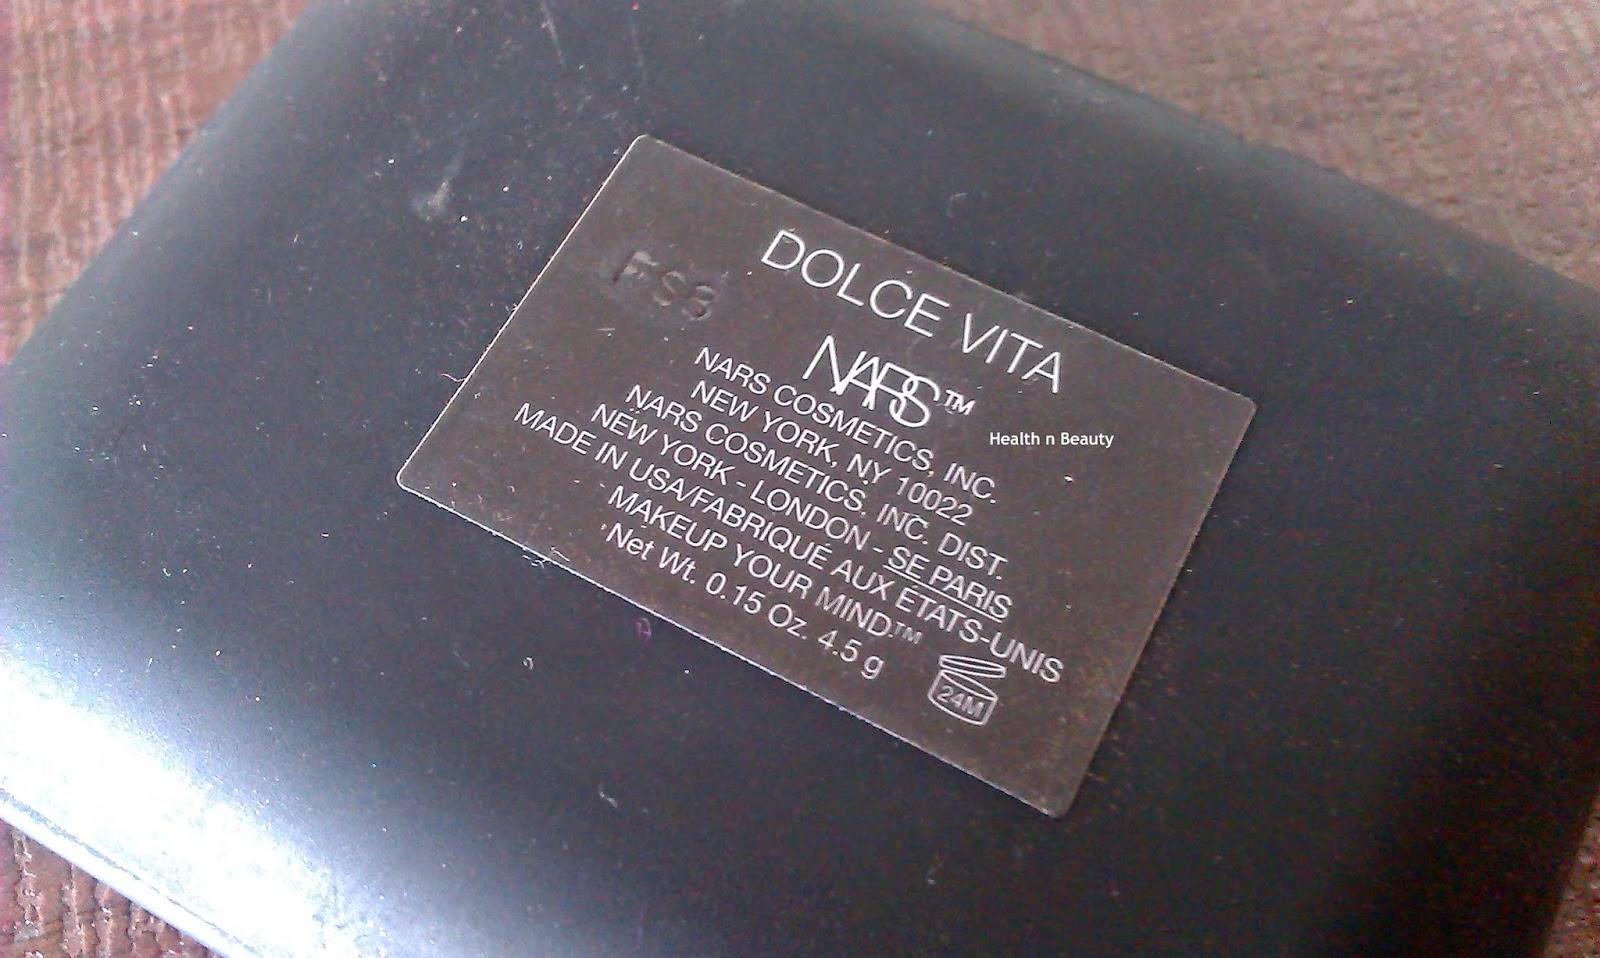 NARS Blush Dolce Vita Review Swatch